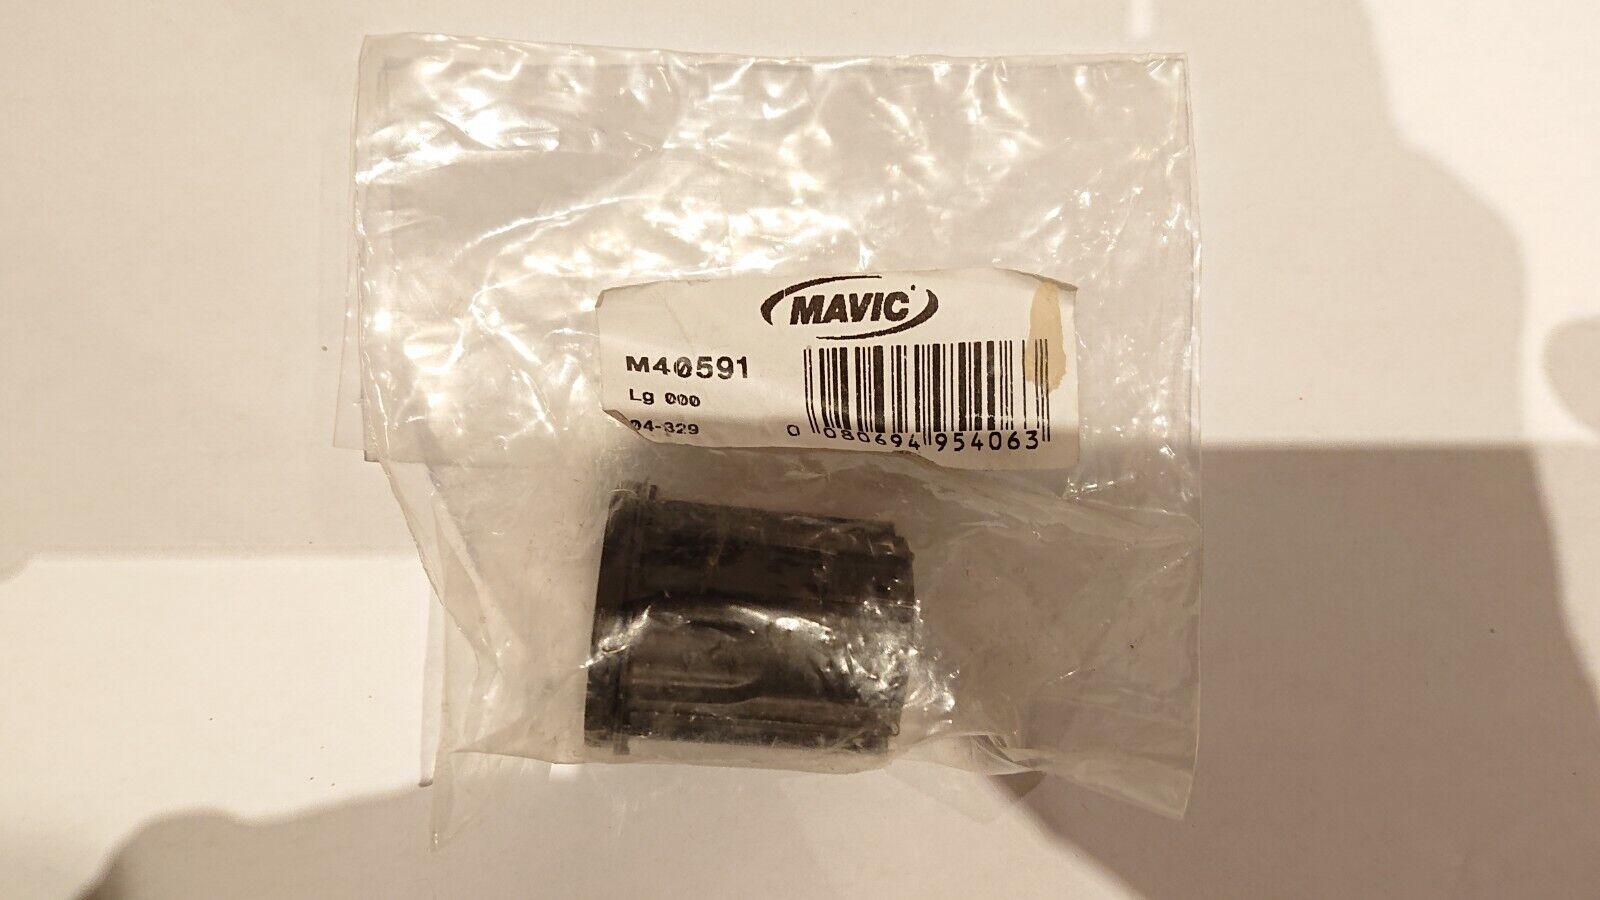 Mavic Freehub Body ED11 - Campagnolo 11-speed - M40591 - Factory 30871201 - New